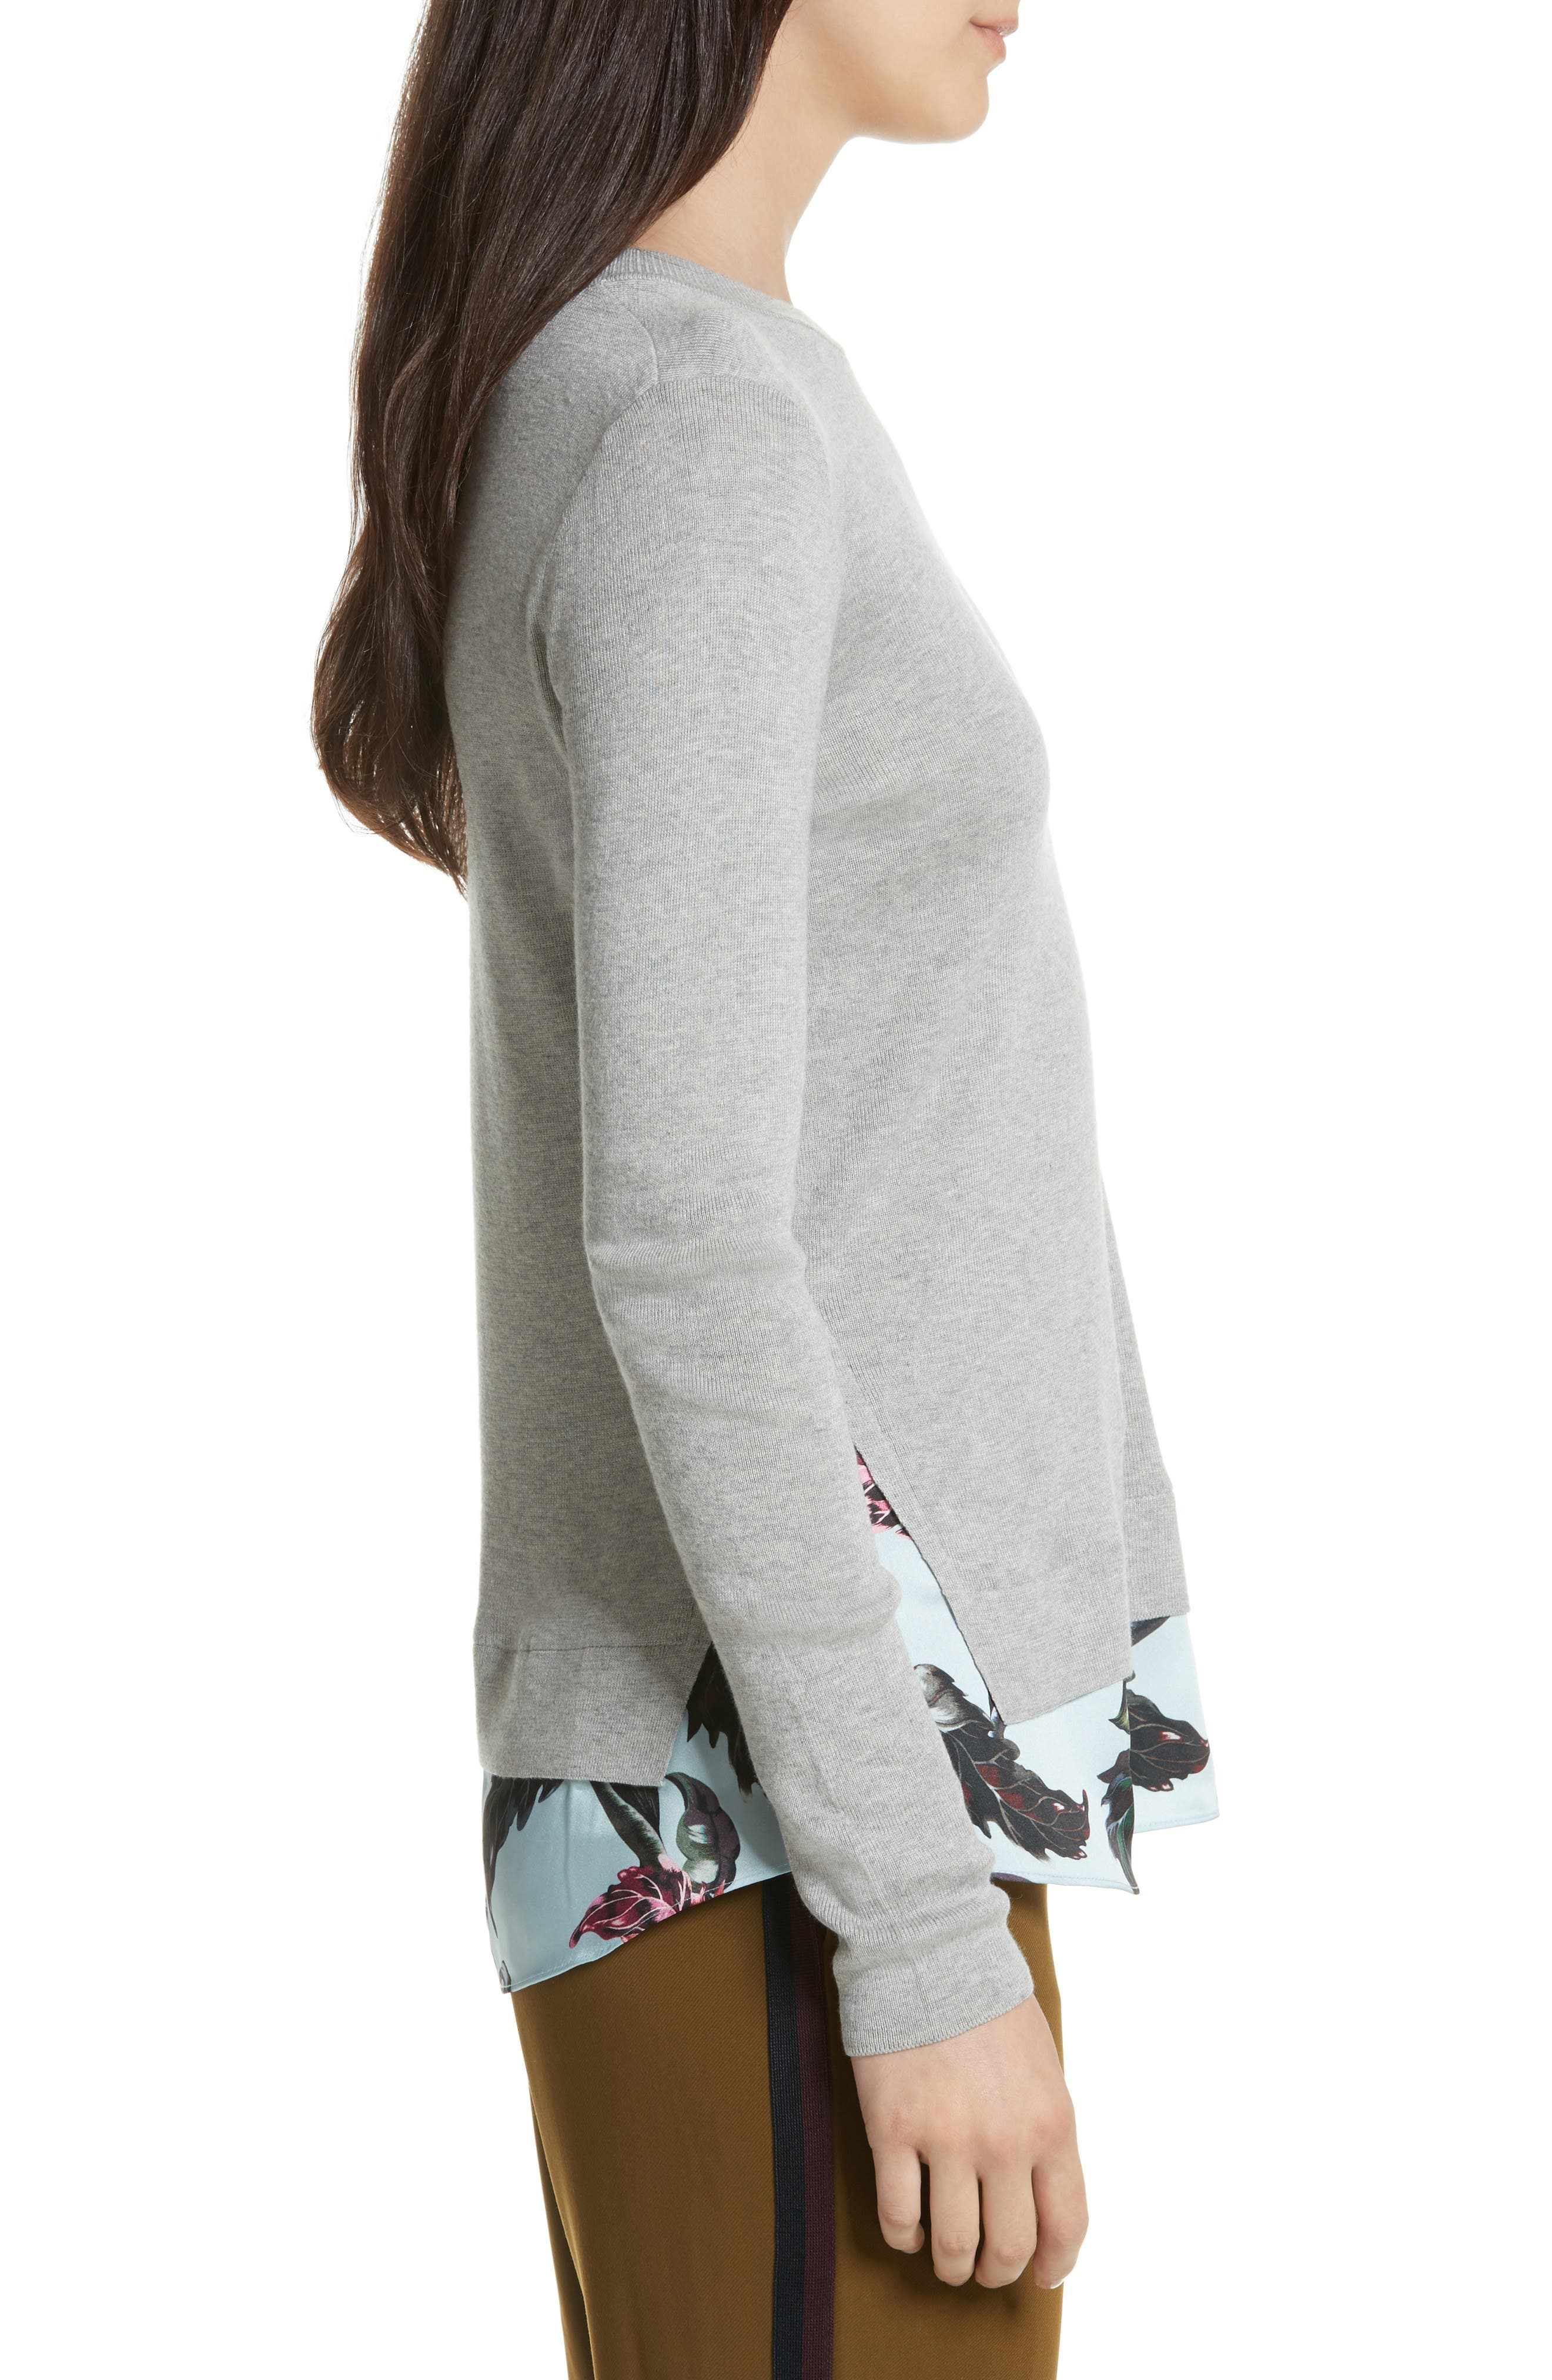 Karley Minerals Mockable Sweater,                             Alternate thumbnail 3, color,                             Light Grey